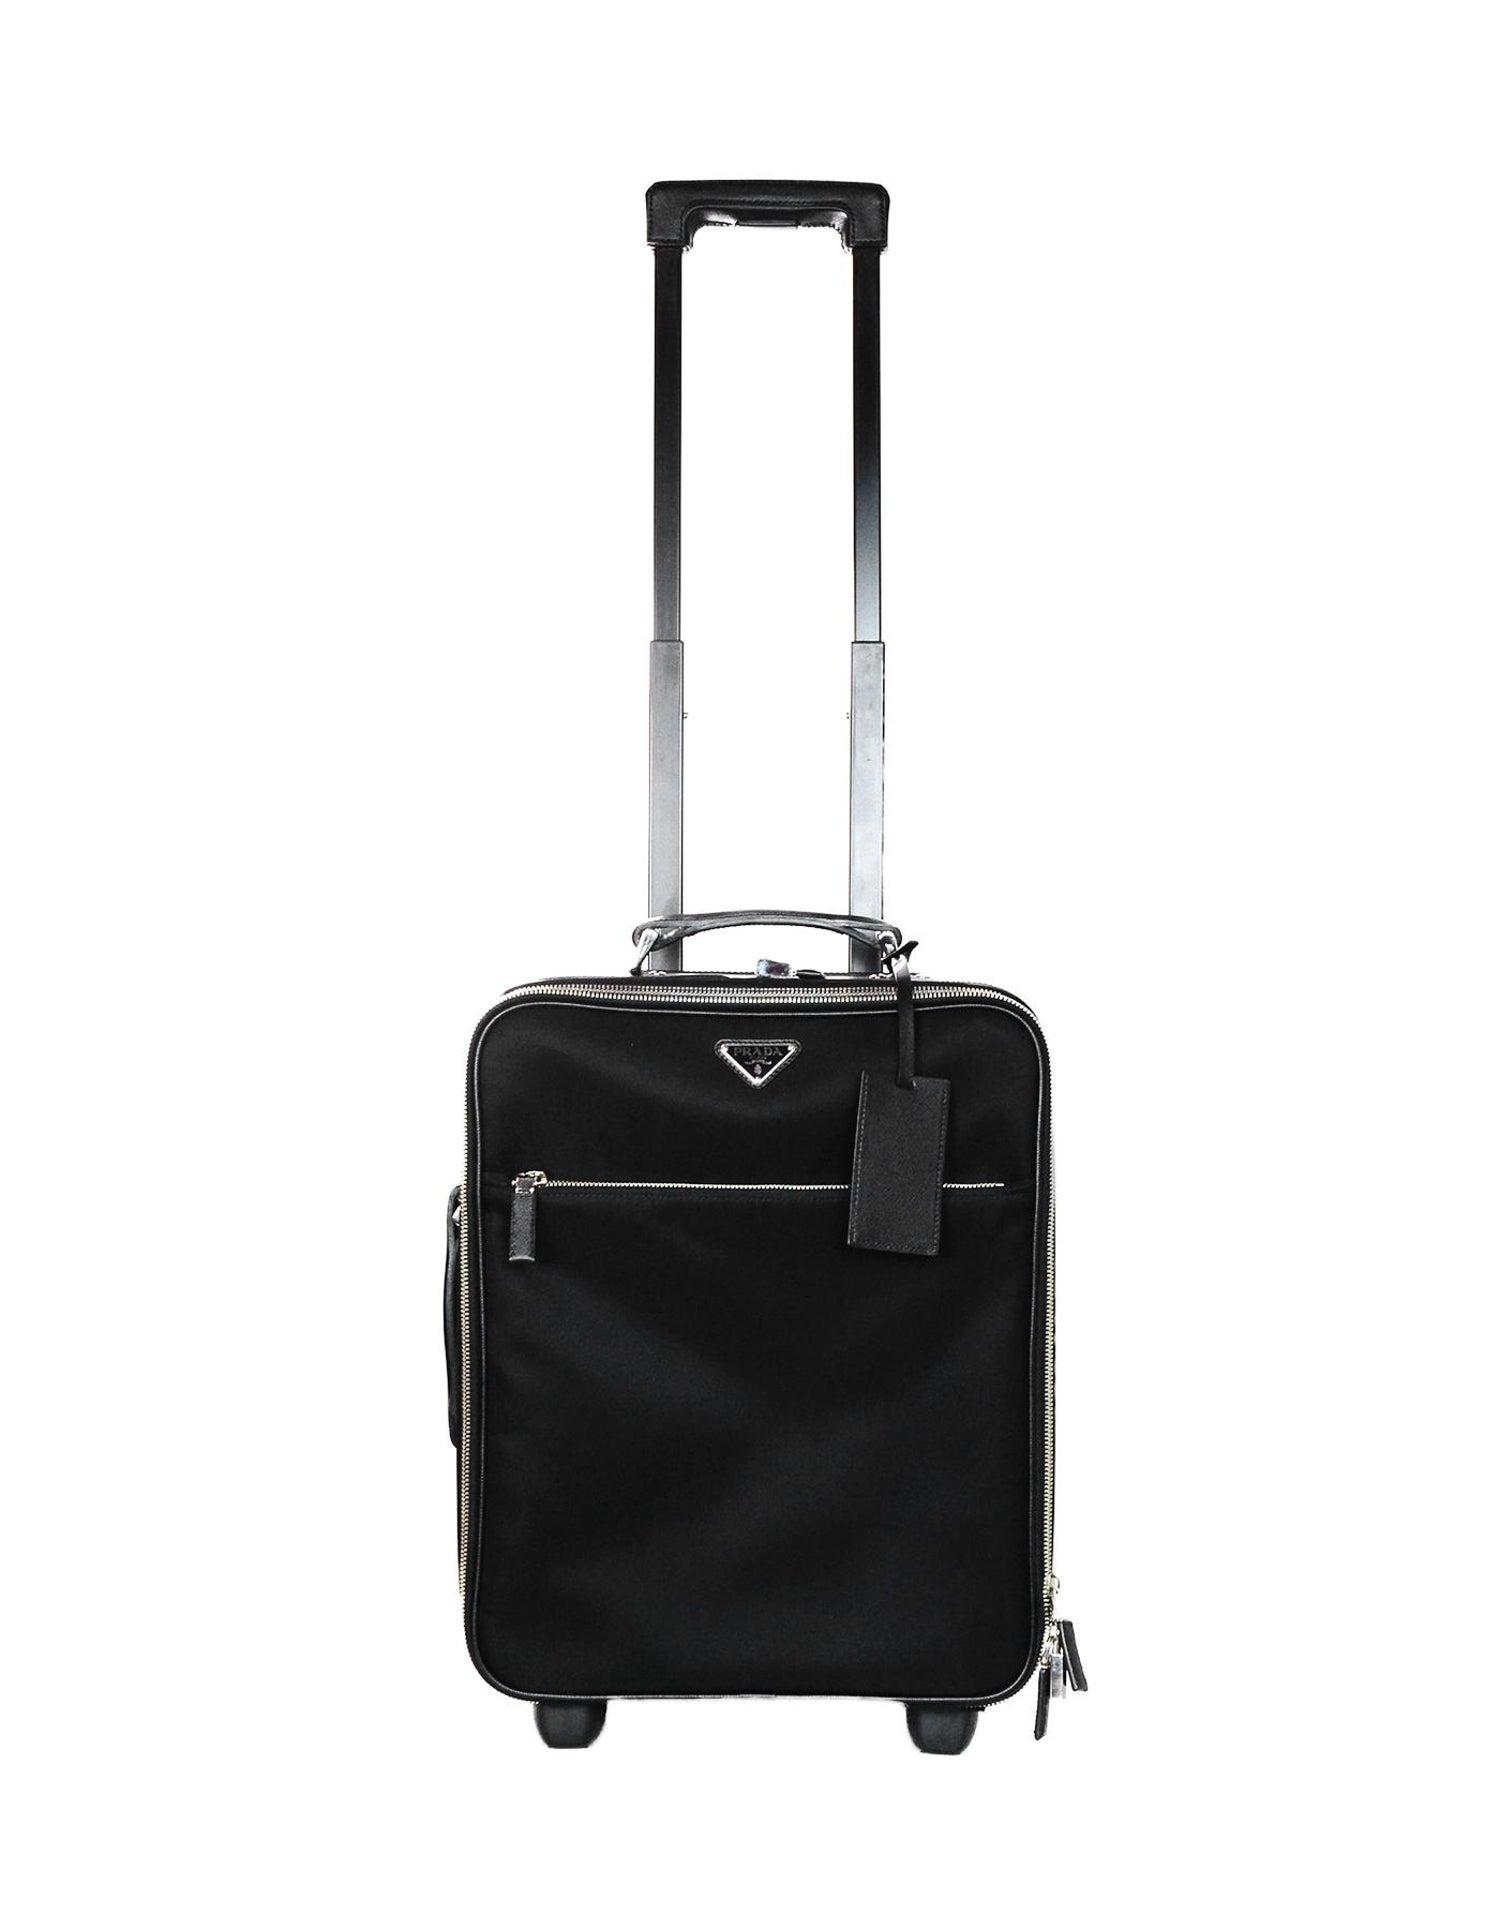 c0baa6507aed Prada Black Nylon/Saffiano Leather 40cm/16